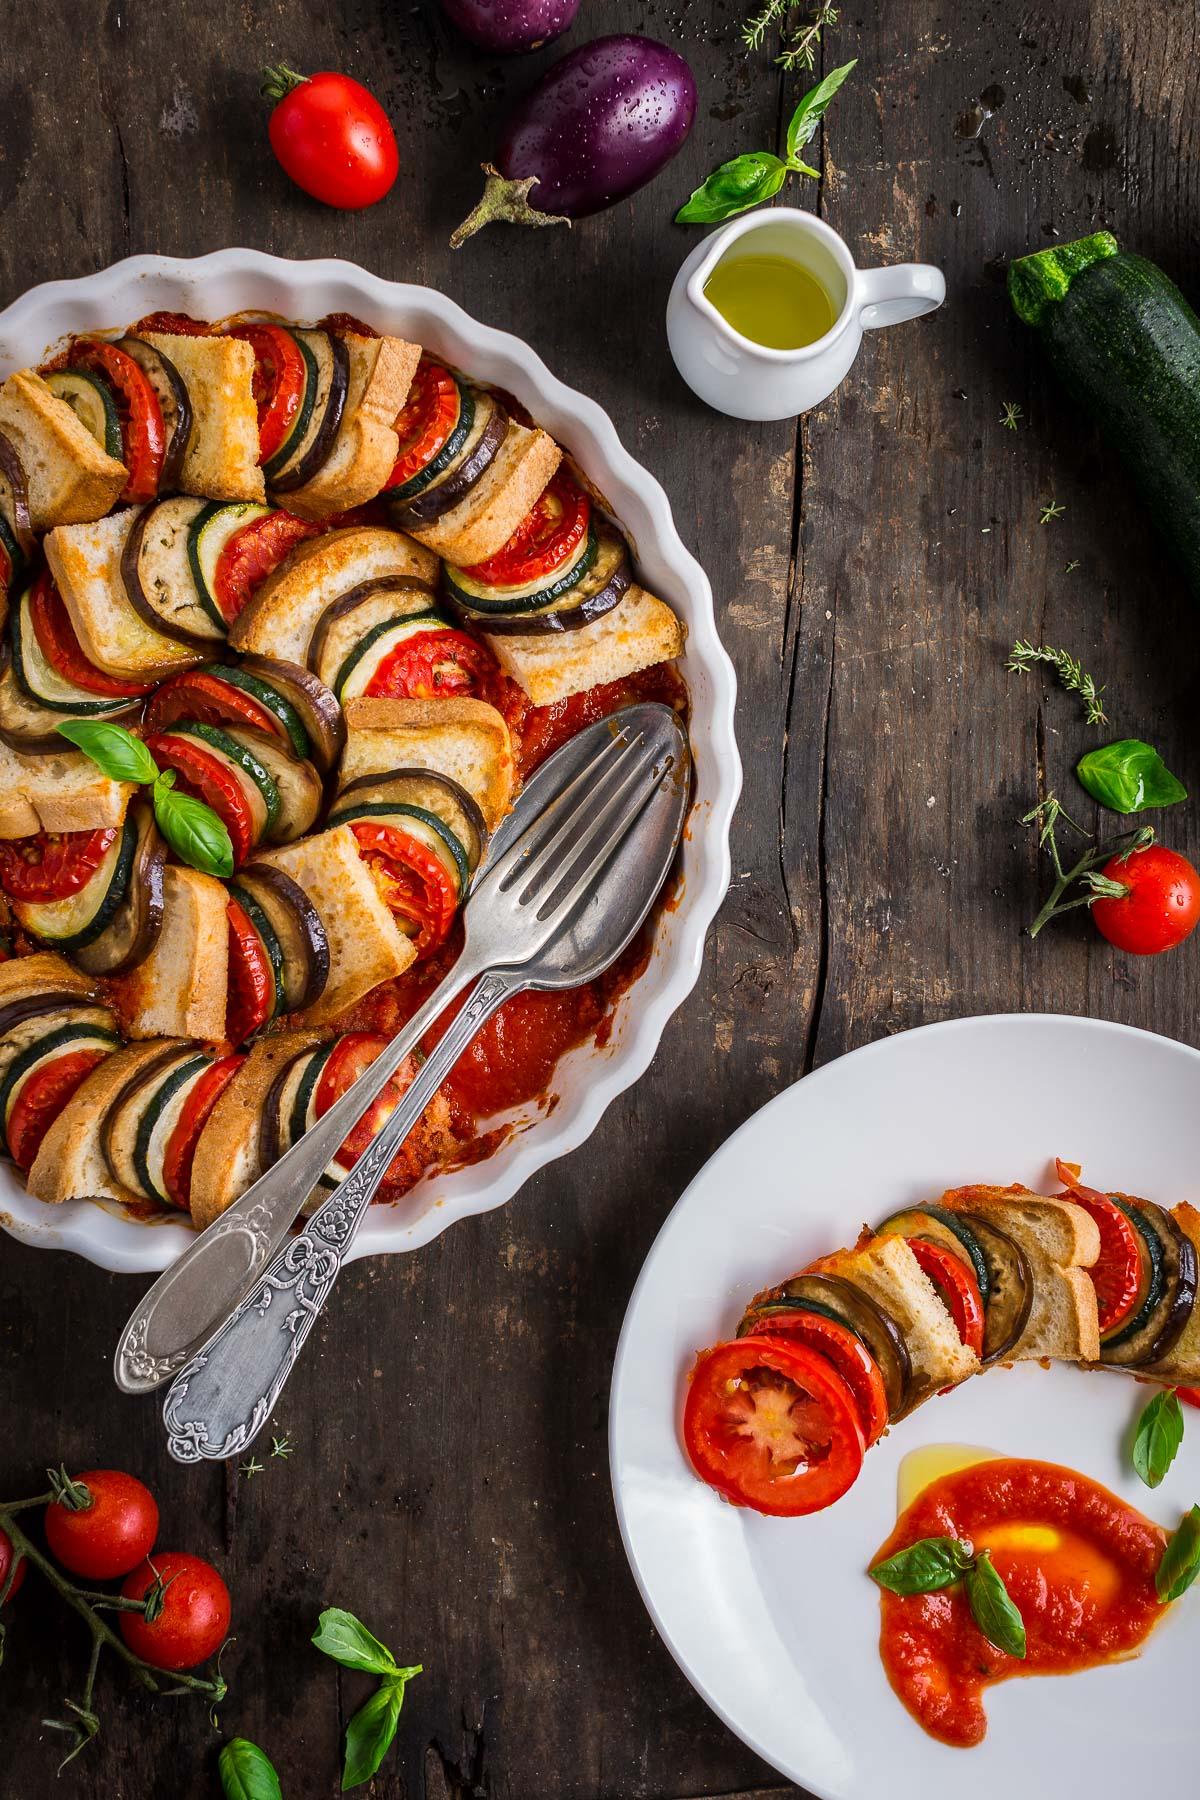 VEGETABLE BREAD RATATOUILLE TIAN recipe #vegan #glutenfree - TIAN RATATOUILLE di pane senza glutine e verdure con melanzane zucchine pomodori